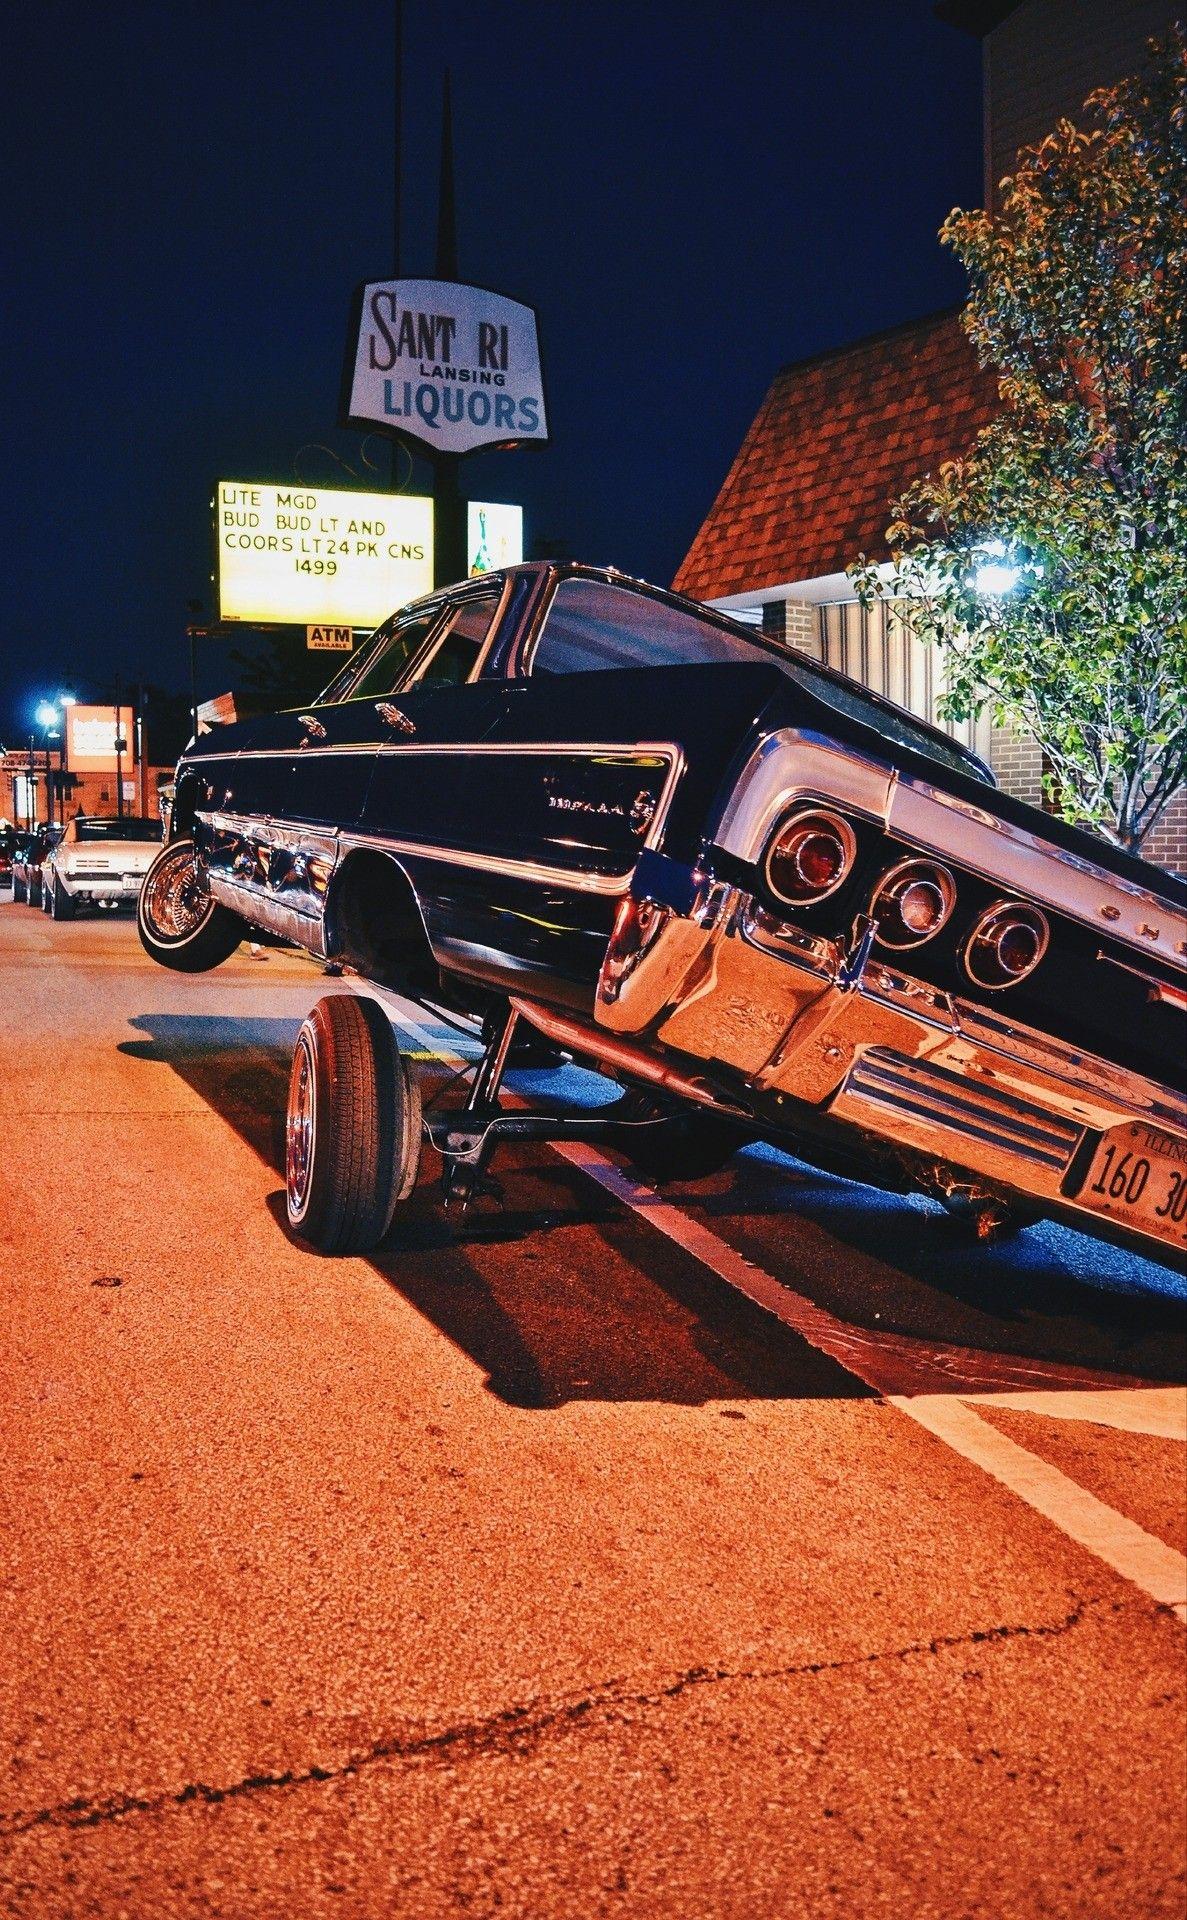 Pin By Don Espinoza On Lowriders Lowriders Hydraulic Cars 64 Impala Lowrider